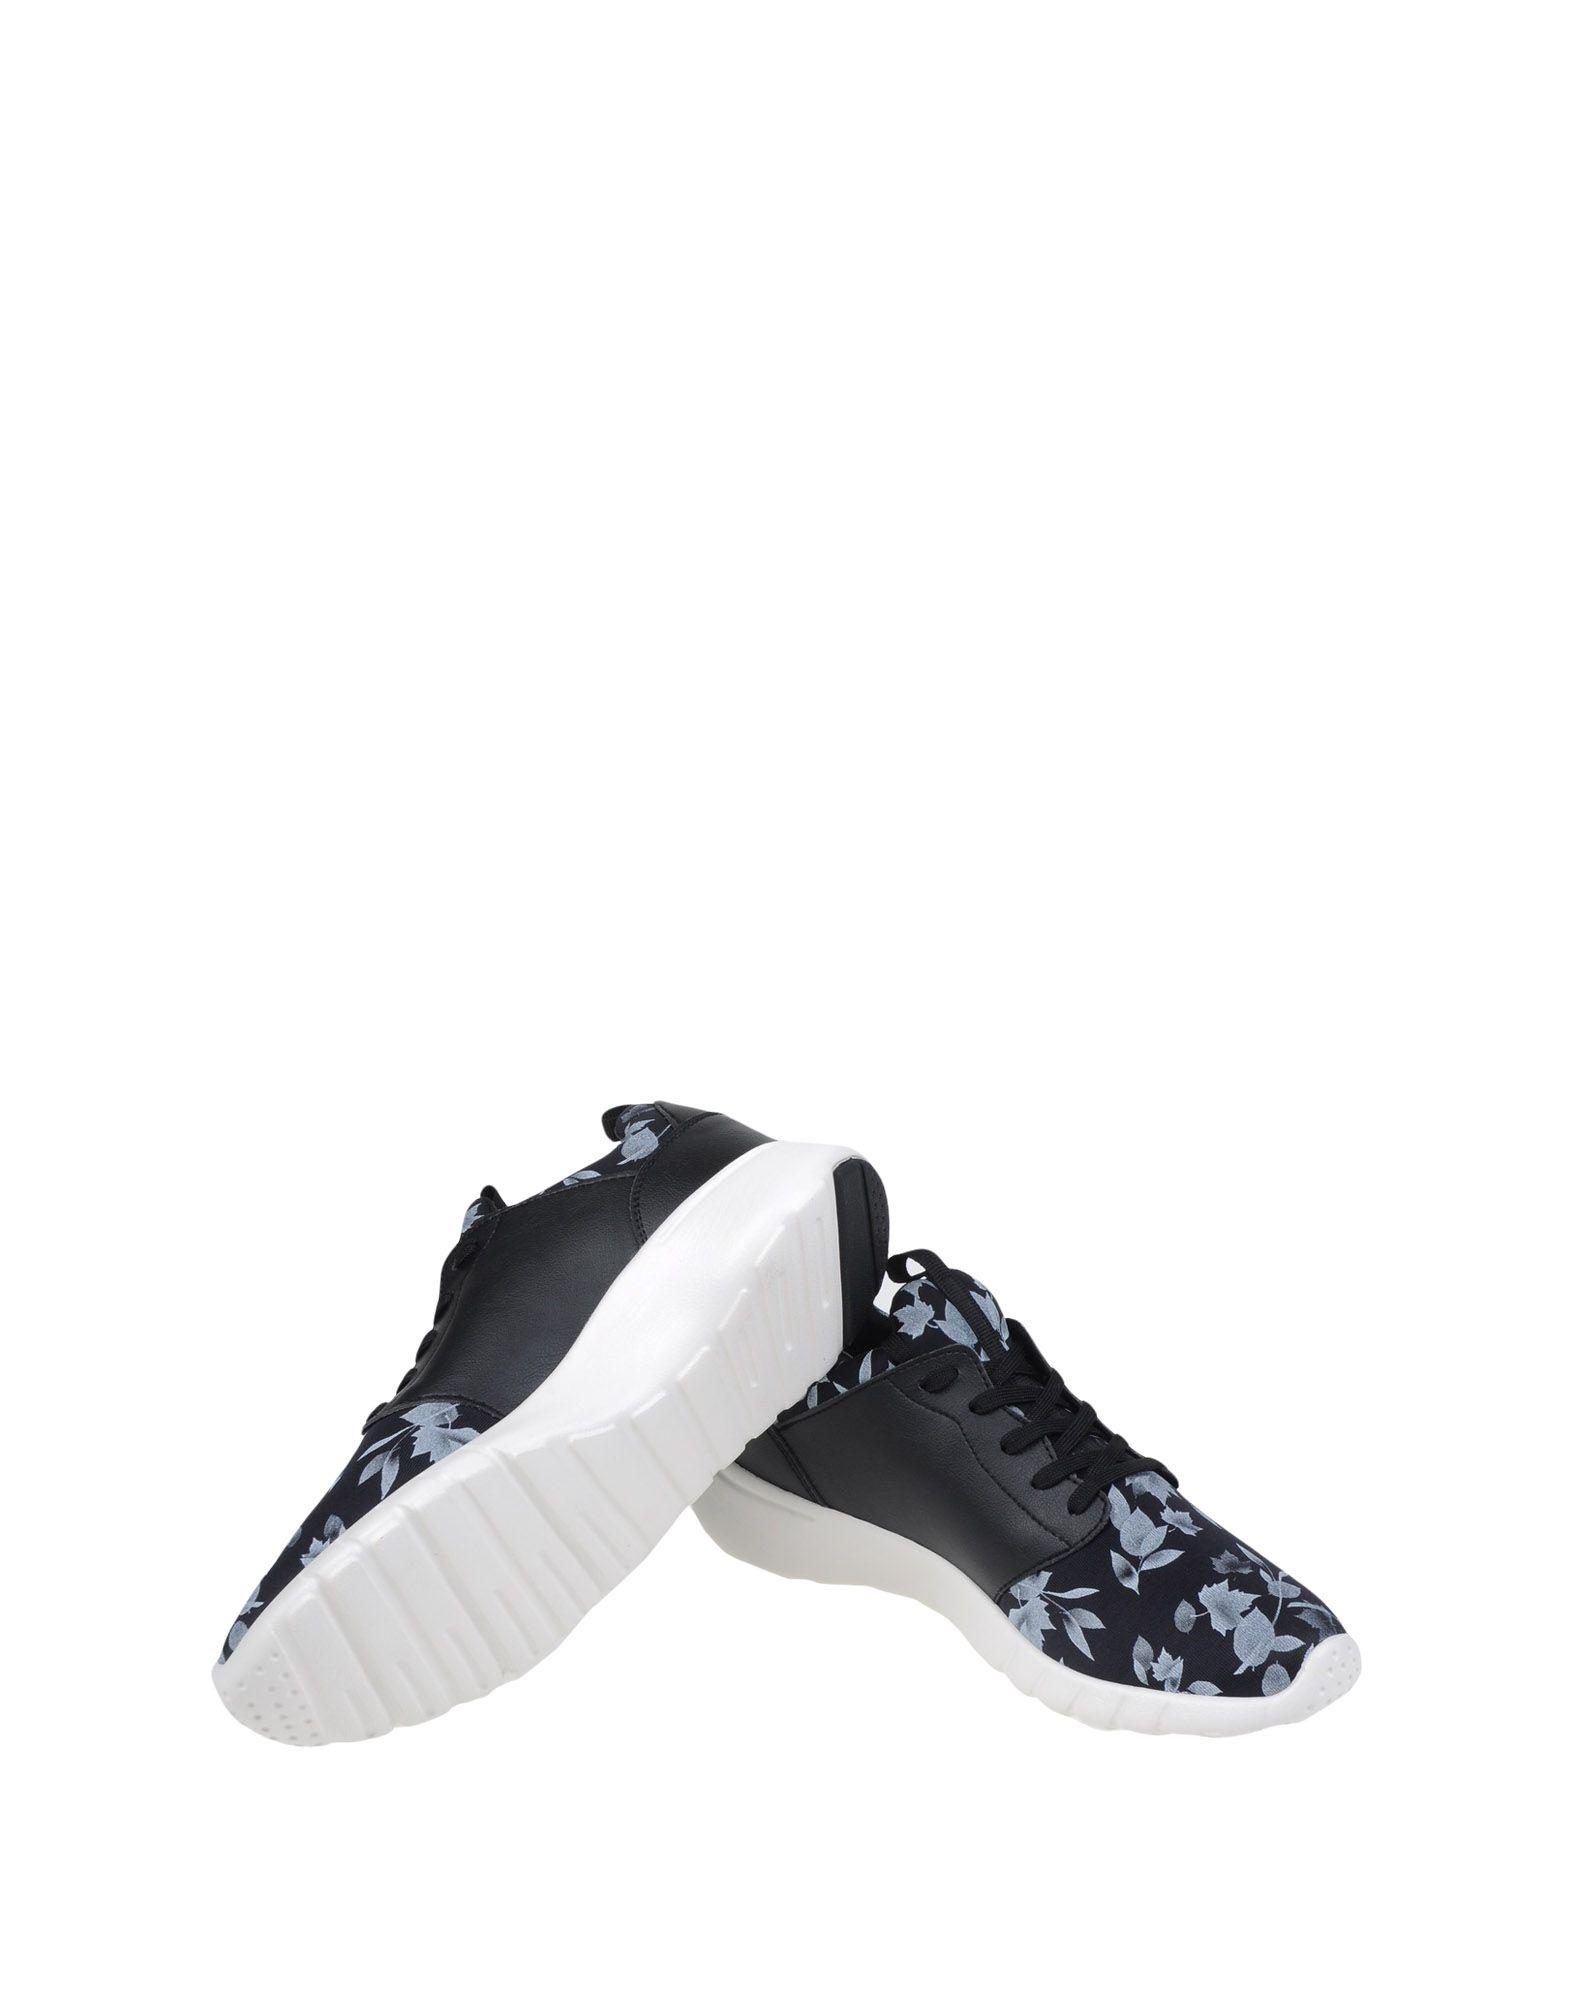 Sneakers Ea7 Lifestyle - New Race Stampa Foglia - Lifestyle Donna - 11115829KW 404160